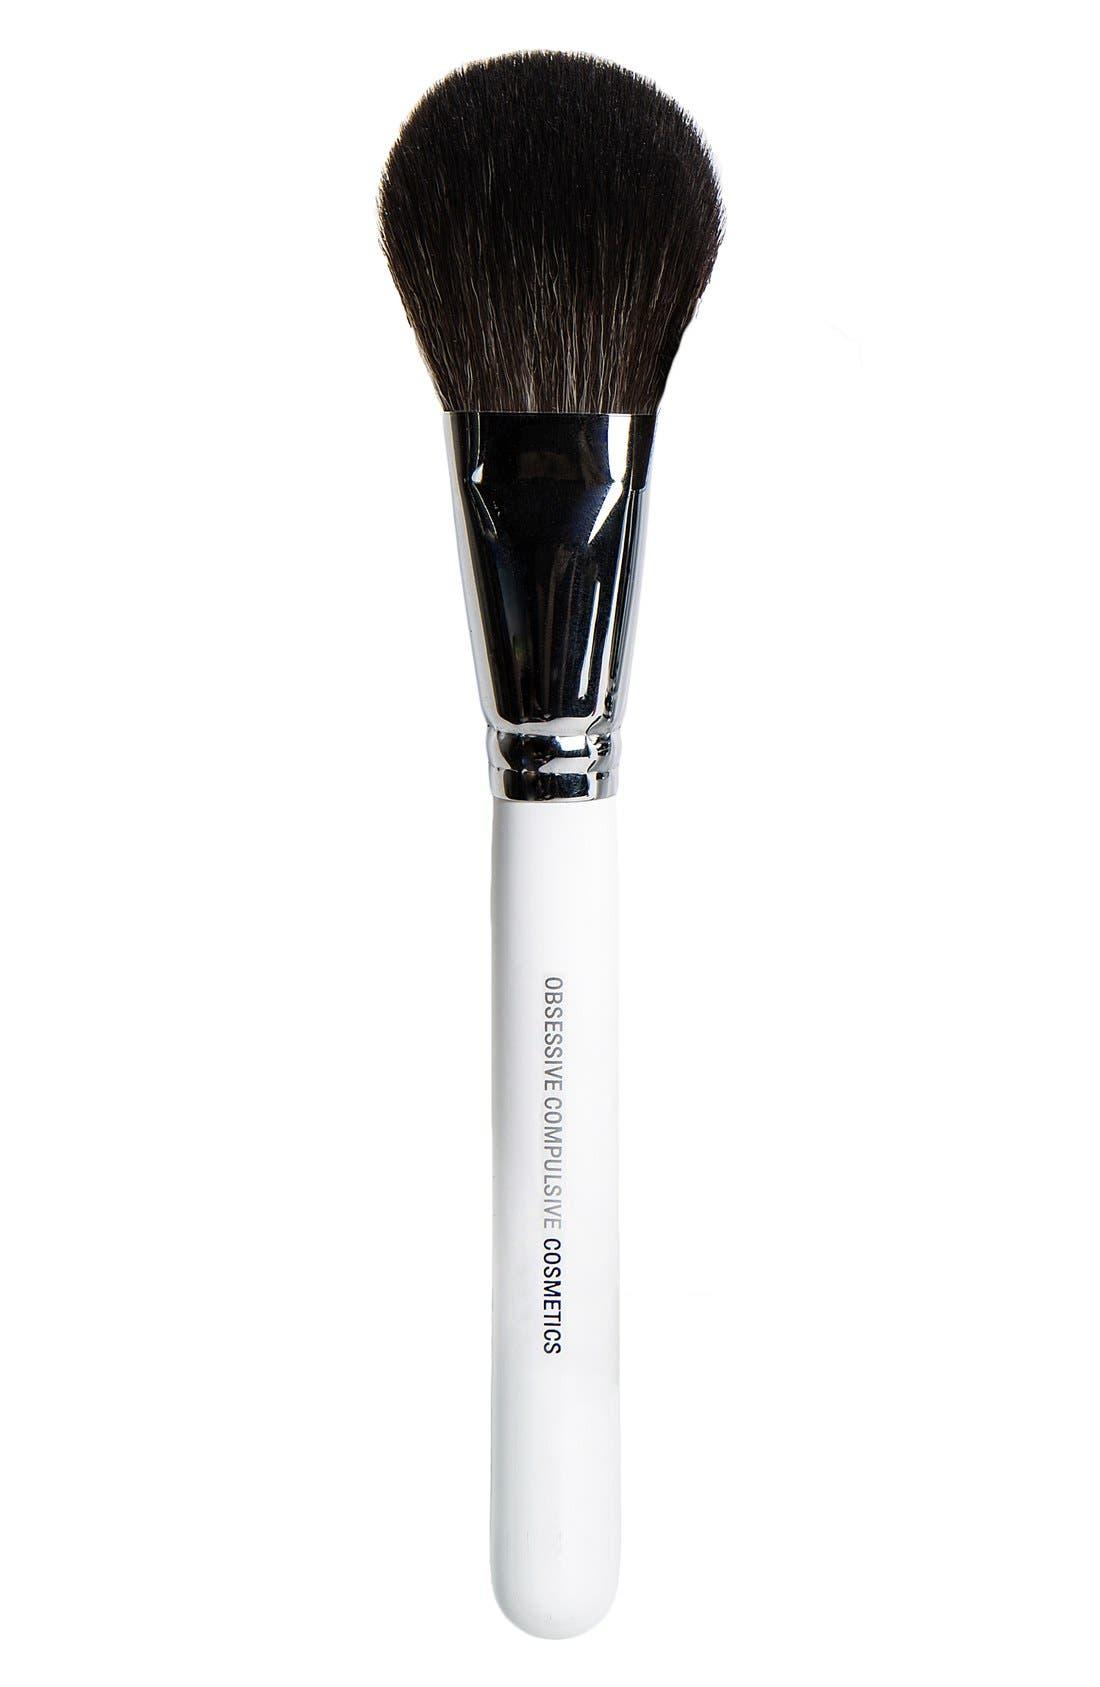 Obsessive Compulsive Cosmetics Large Powder Brush